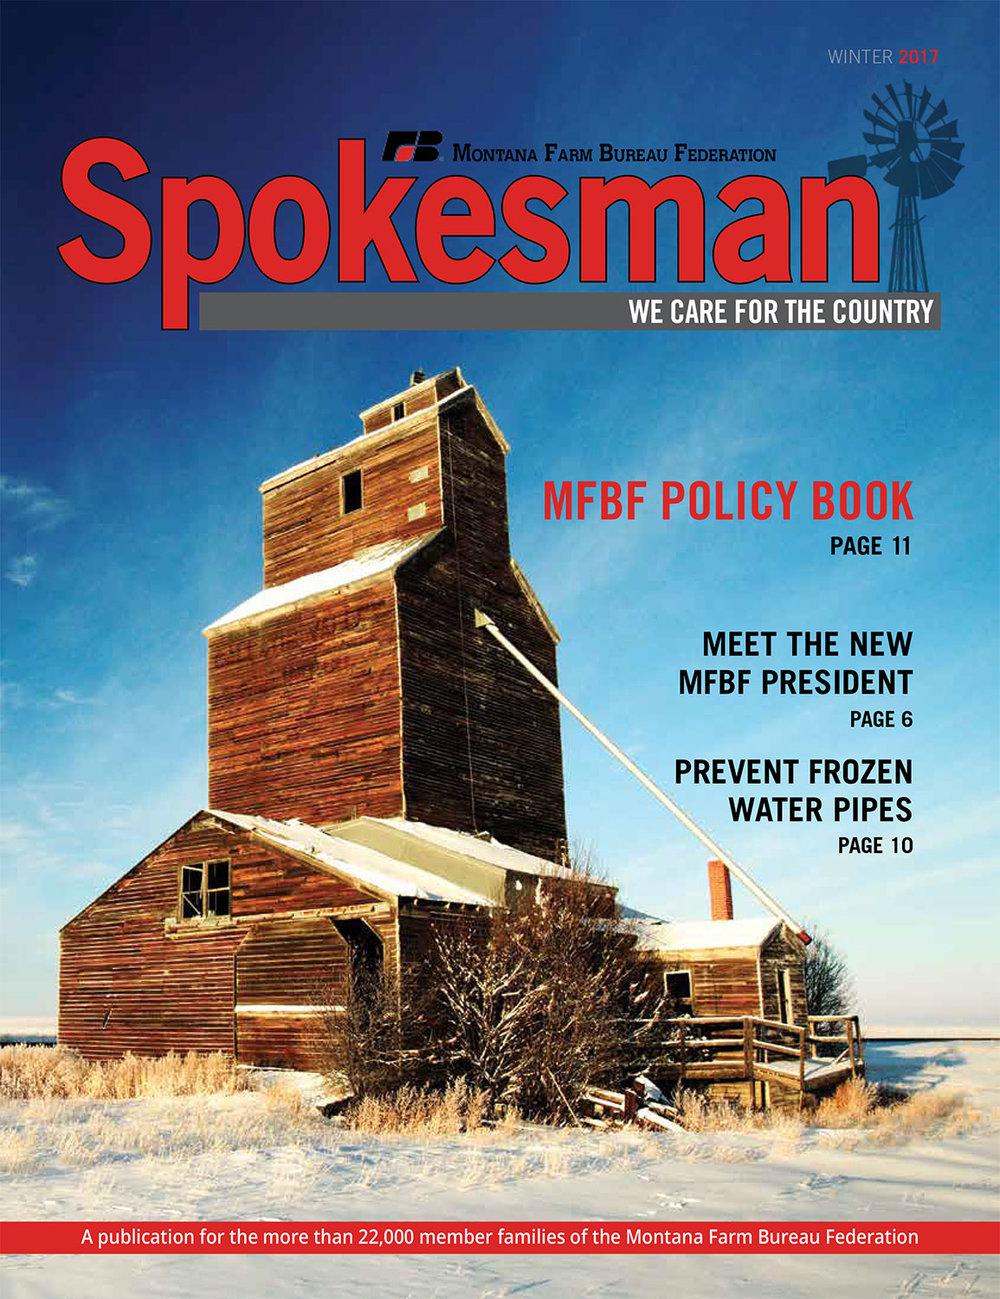 Photos-of-Montana-Grain-Elevators-Published-on-Cover-of-Montana-Farm-Bureau-Magazine